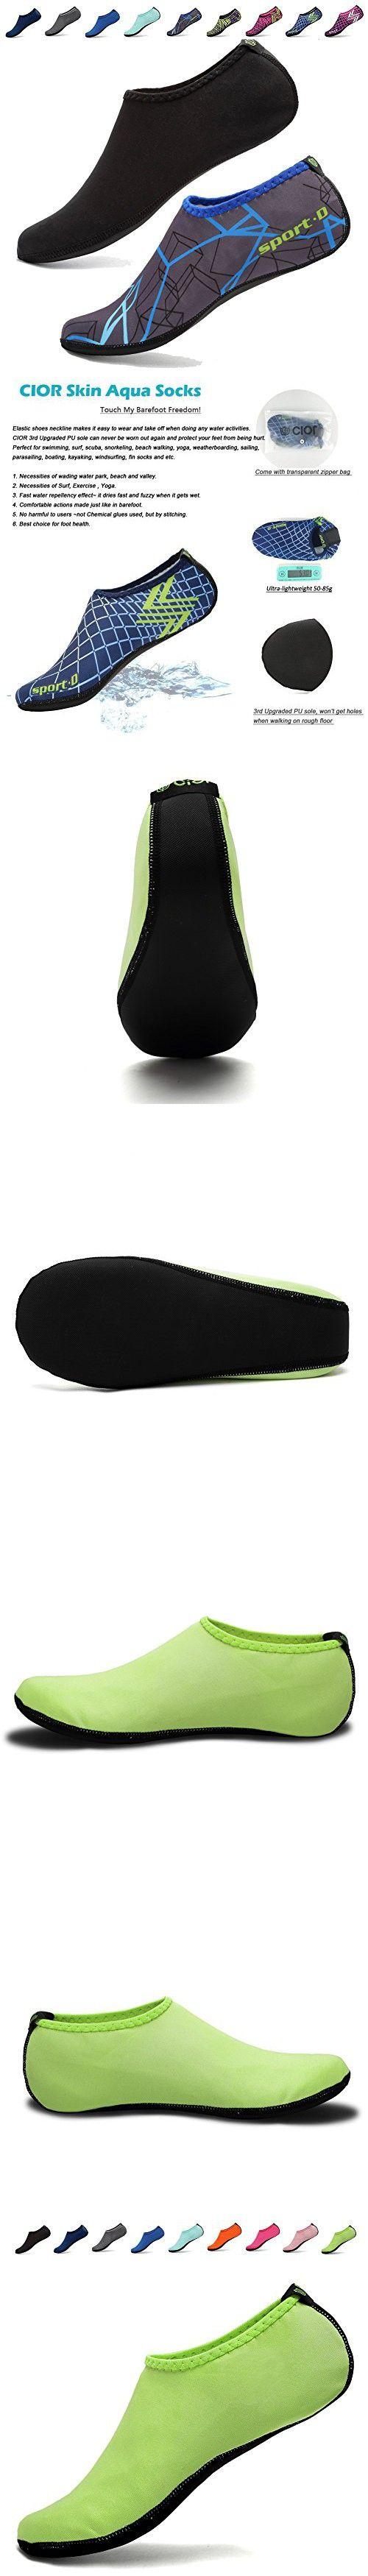 CIOR 3rd Upgraded Version Durable Sole Barefoot Water Skin Shoes Aqua Socks For Beach Pool Sand Swim Surf Yoga Water Aerobics,shs03,green,L